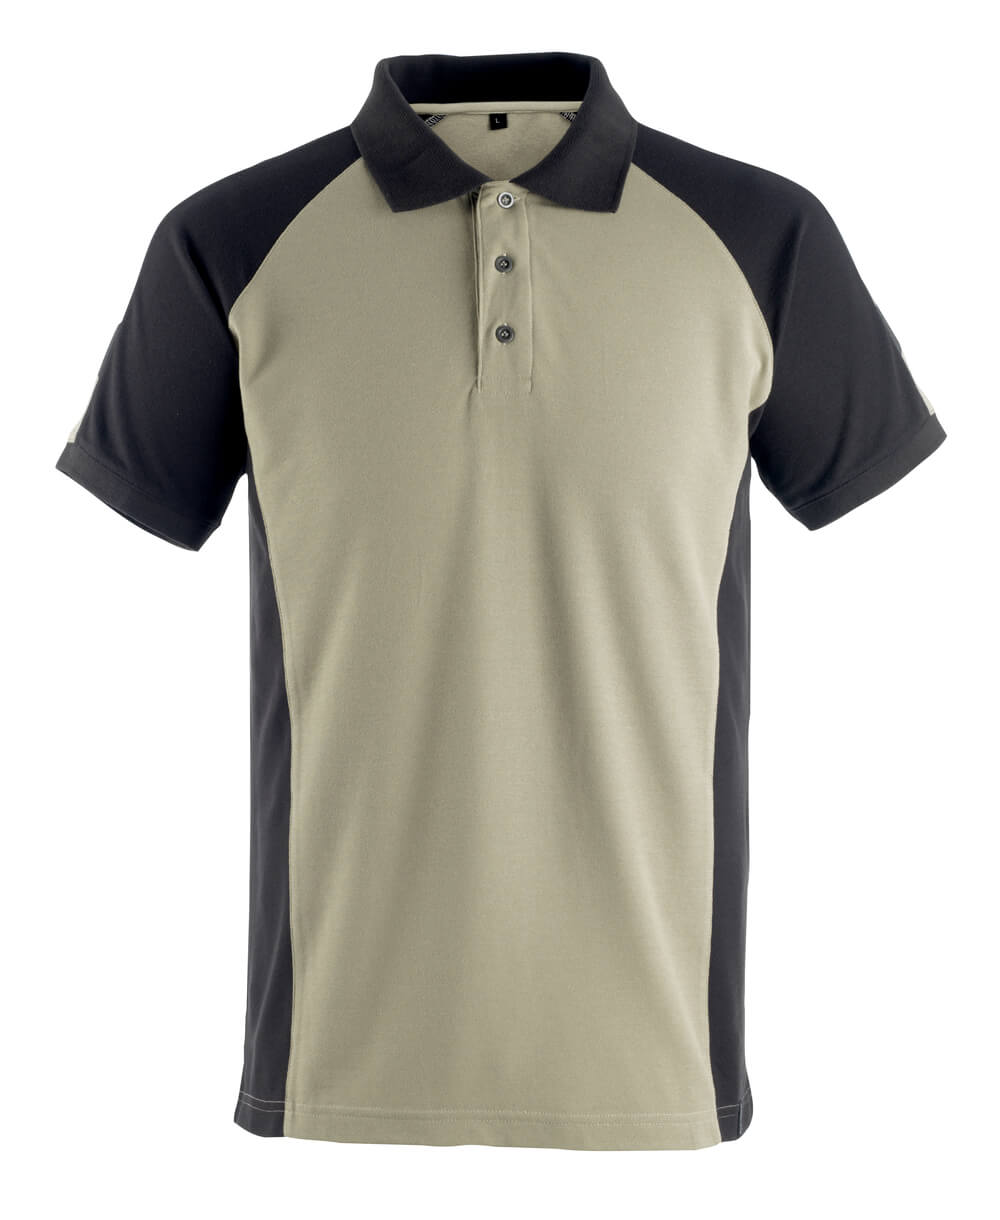 50502-260-5509 Koszulka Polo - jasny khaki/czerń